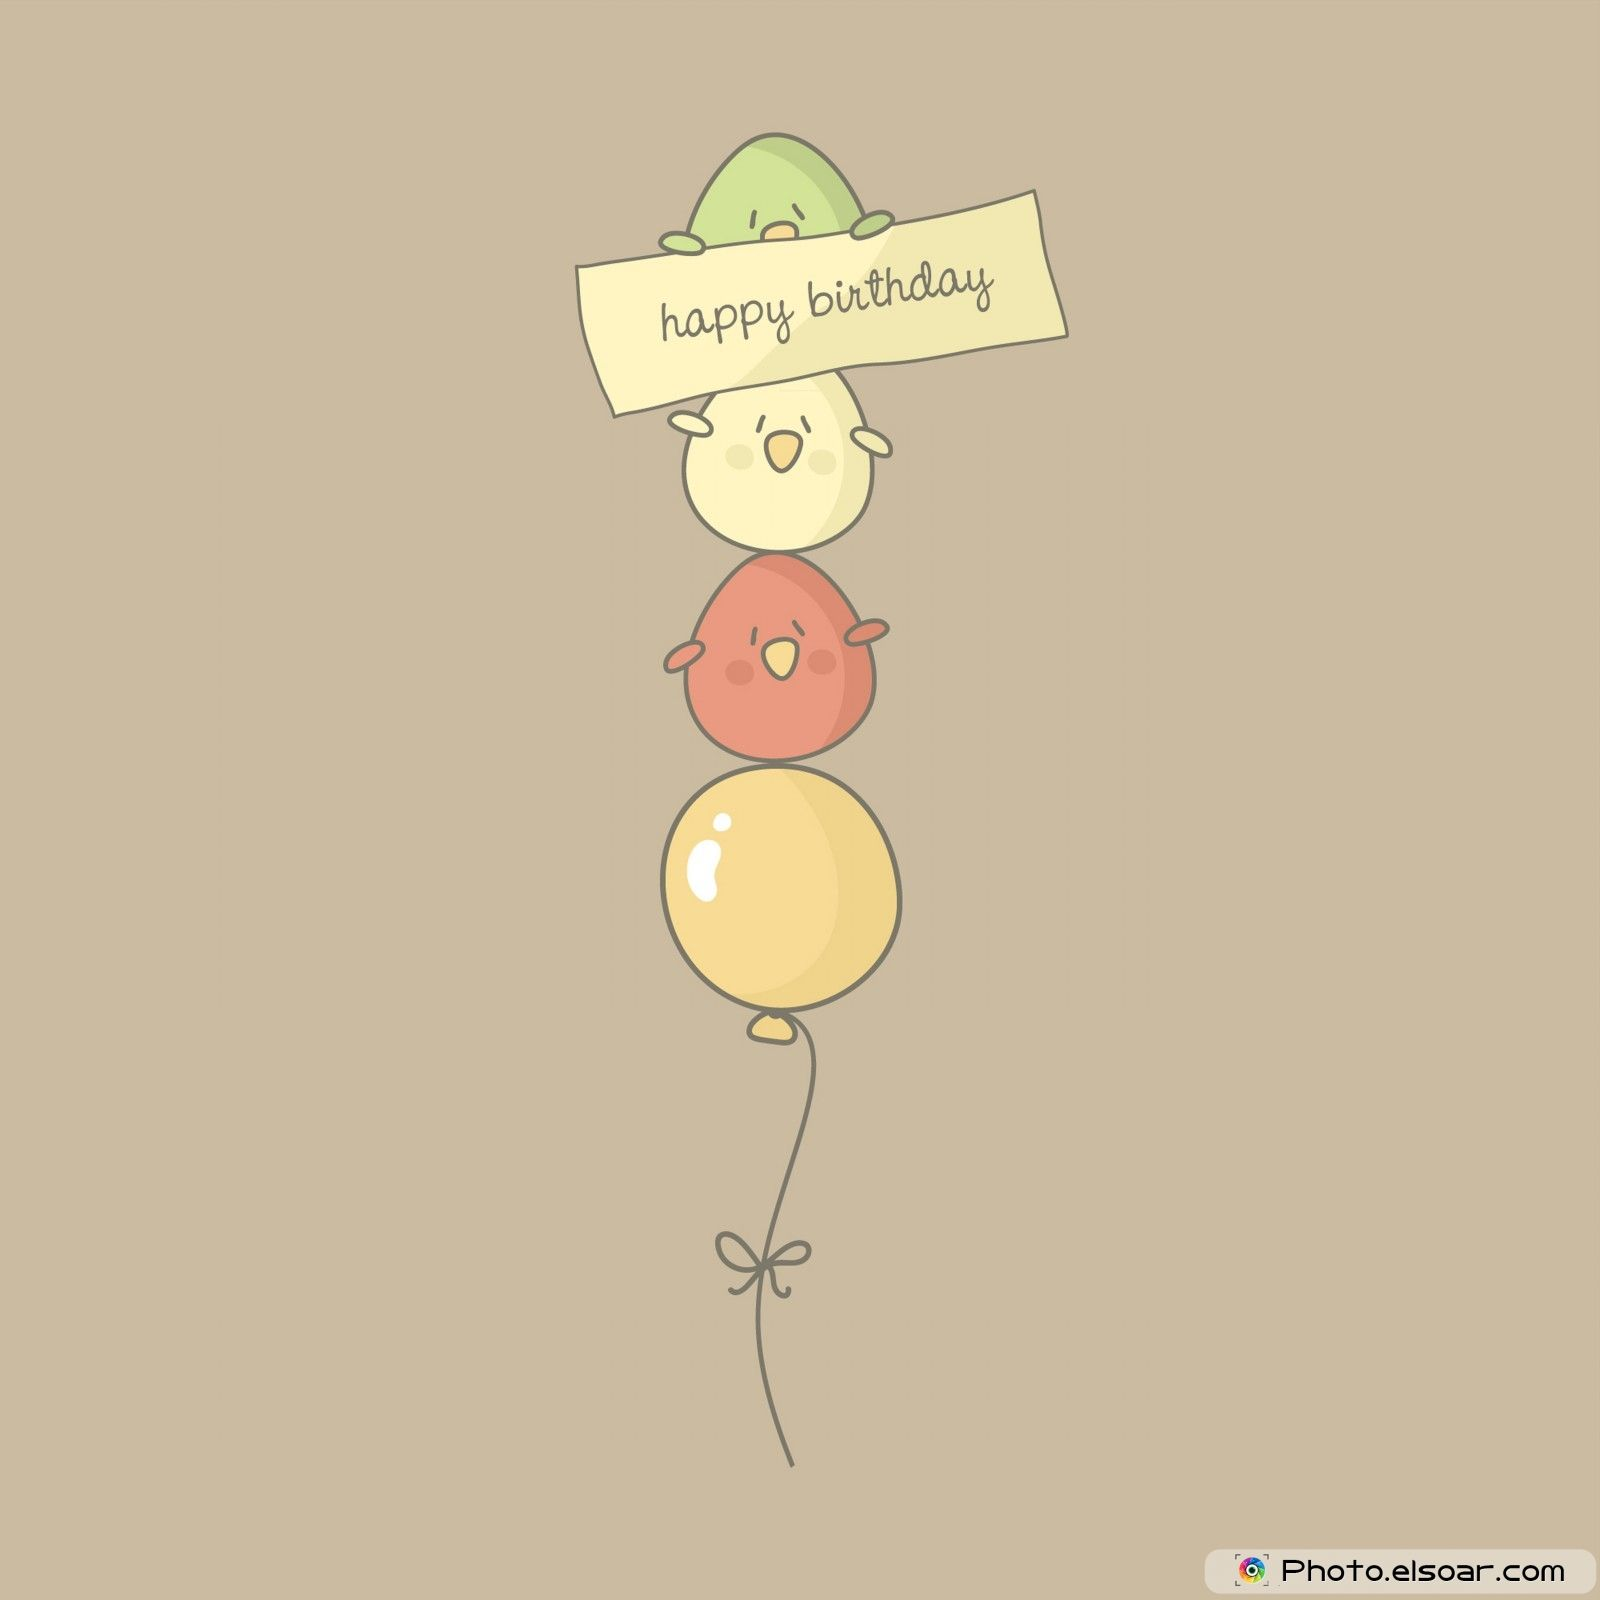 Birthday card with cute birds flying on a balloon – Happy Birthday Card Cute